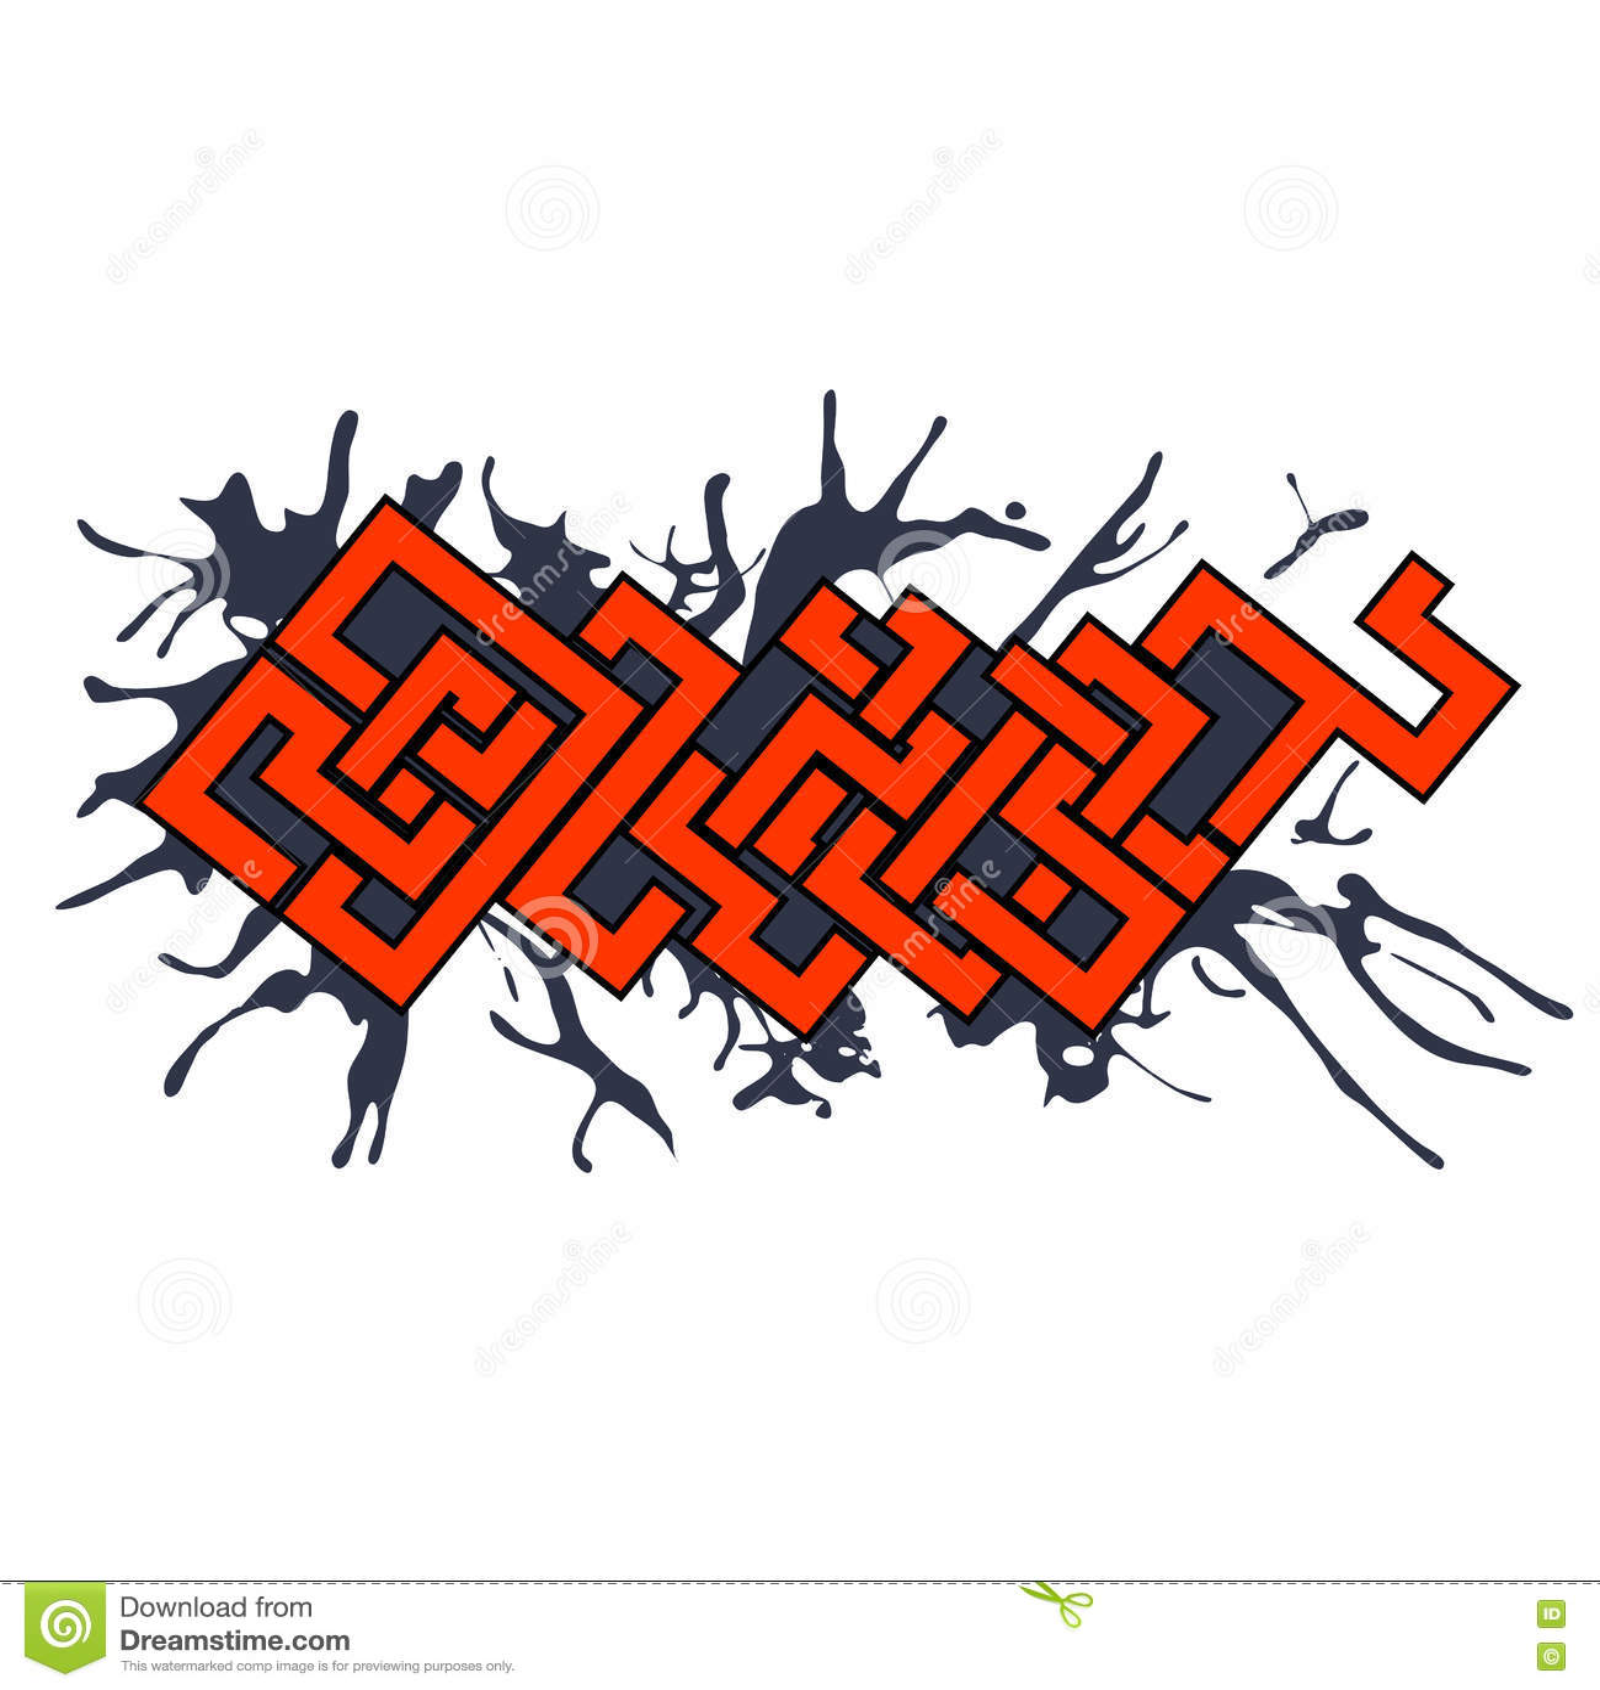 Graffiti art designs - Graffiti Vector Art Urban Design Element Stock Photography